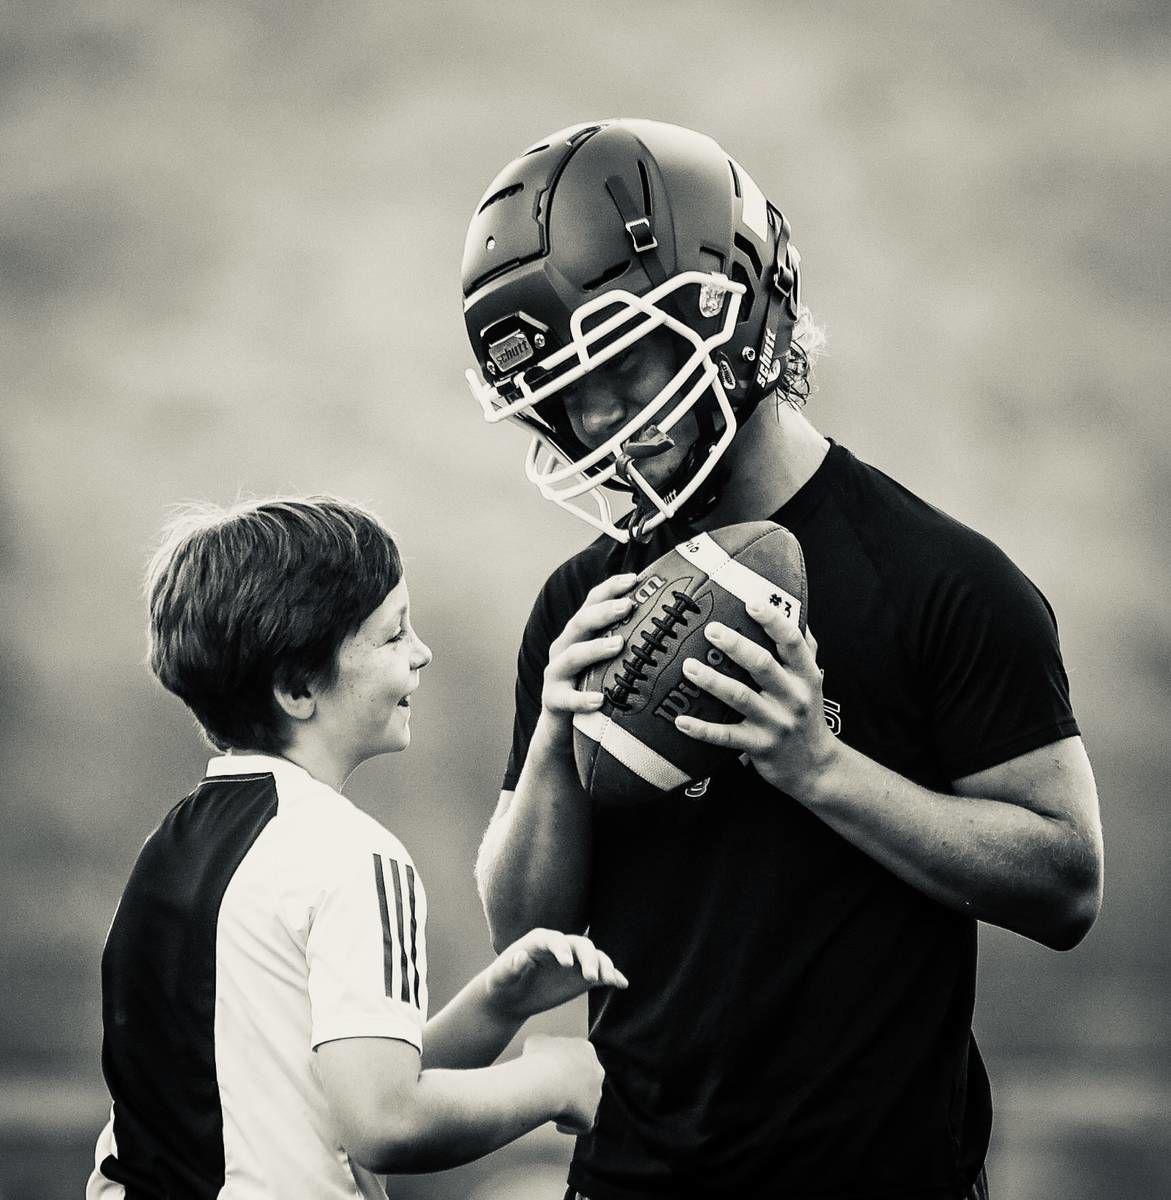 PHOTOS: St. J Academy football practices on second day of preseason